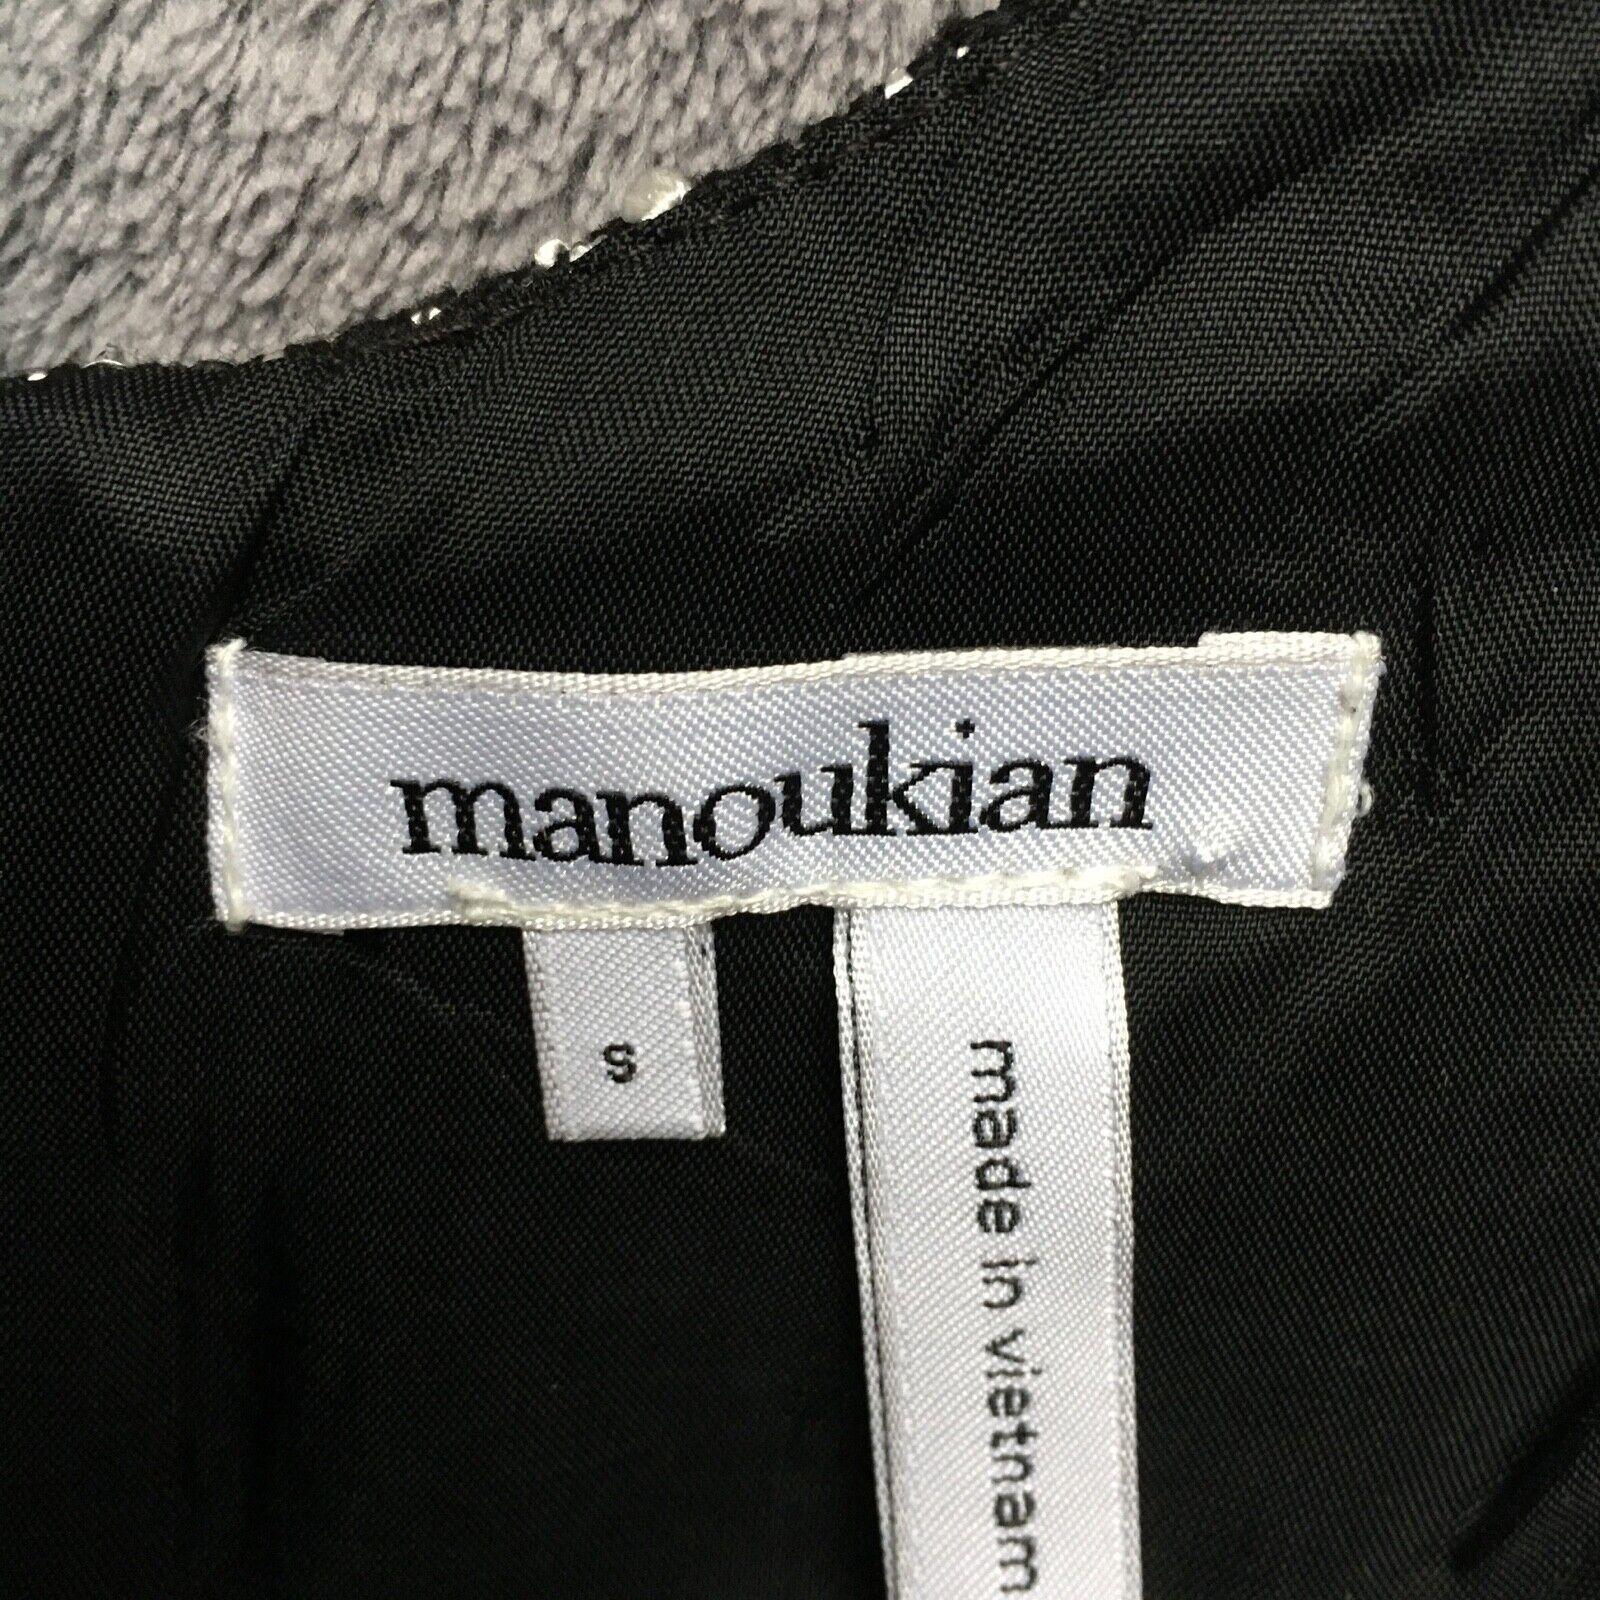 Robe manoukian bimatière tweed avec simili cuir - taille s (36/38)